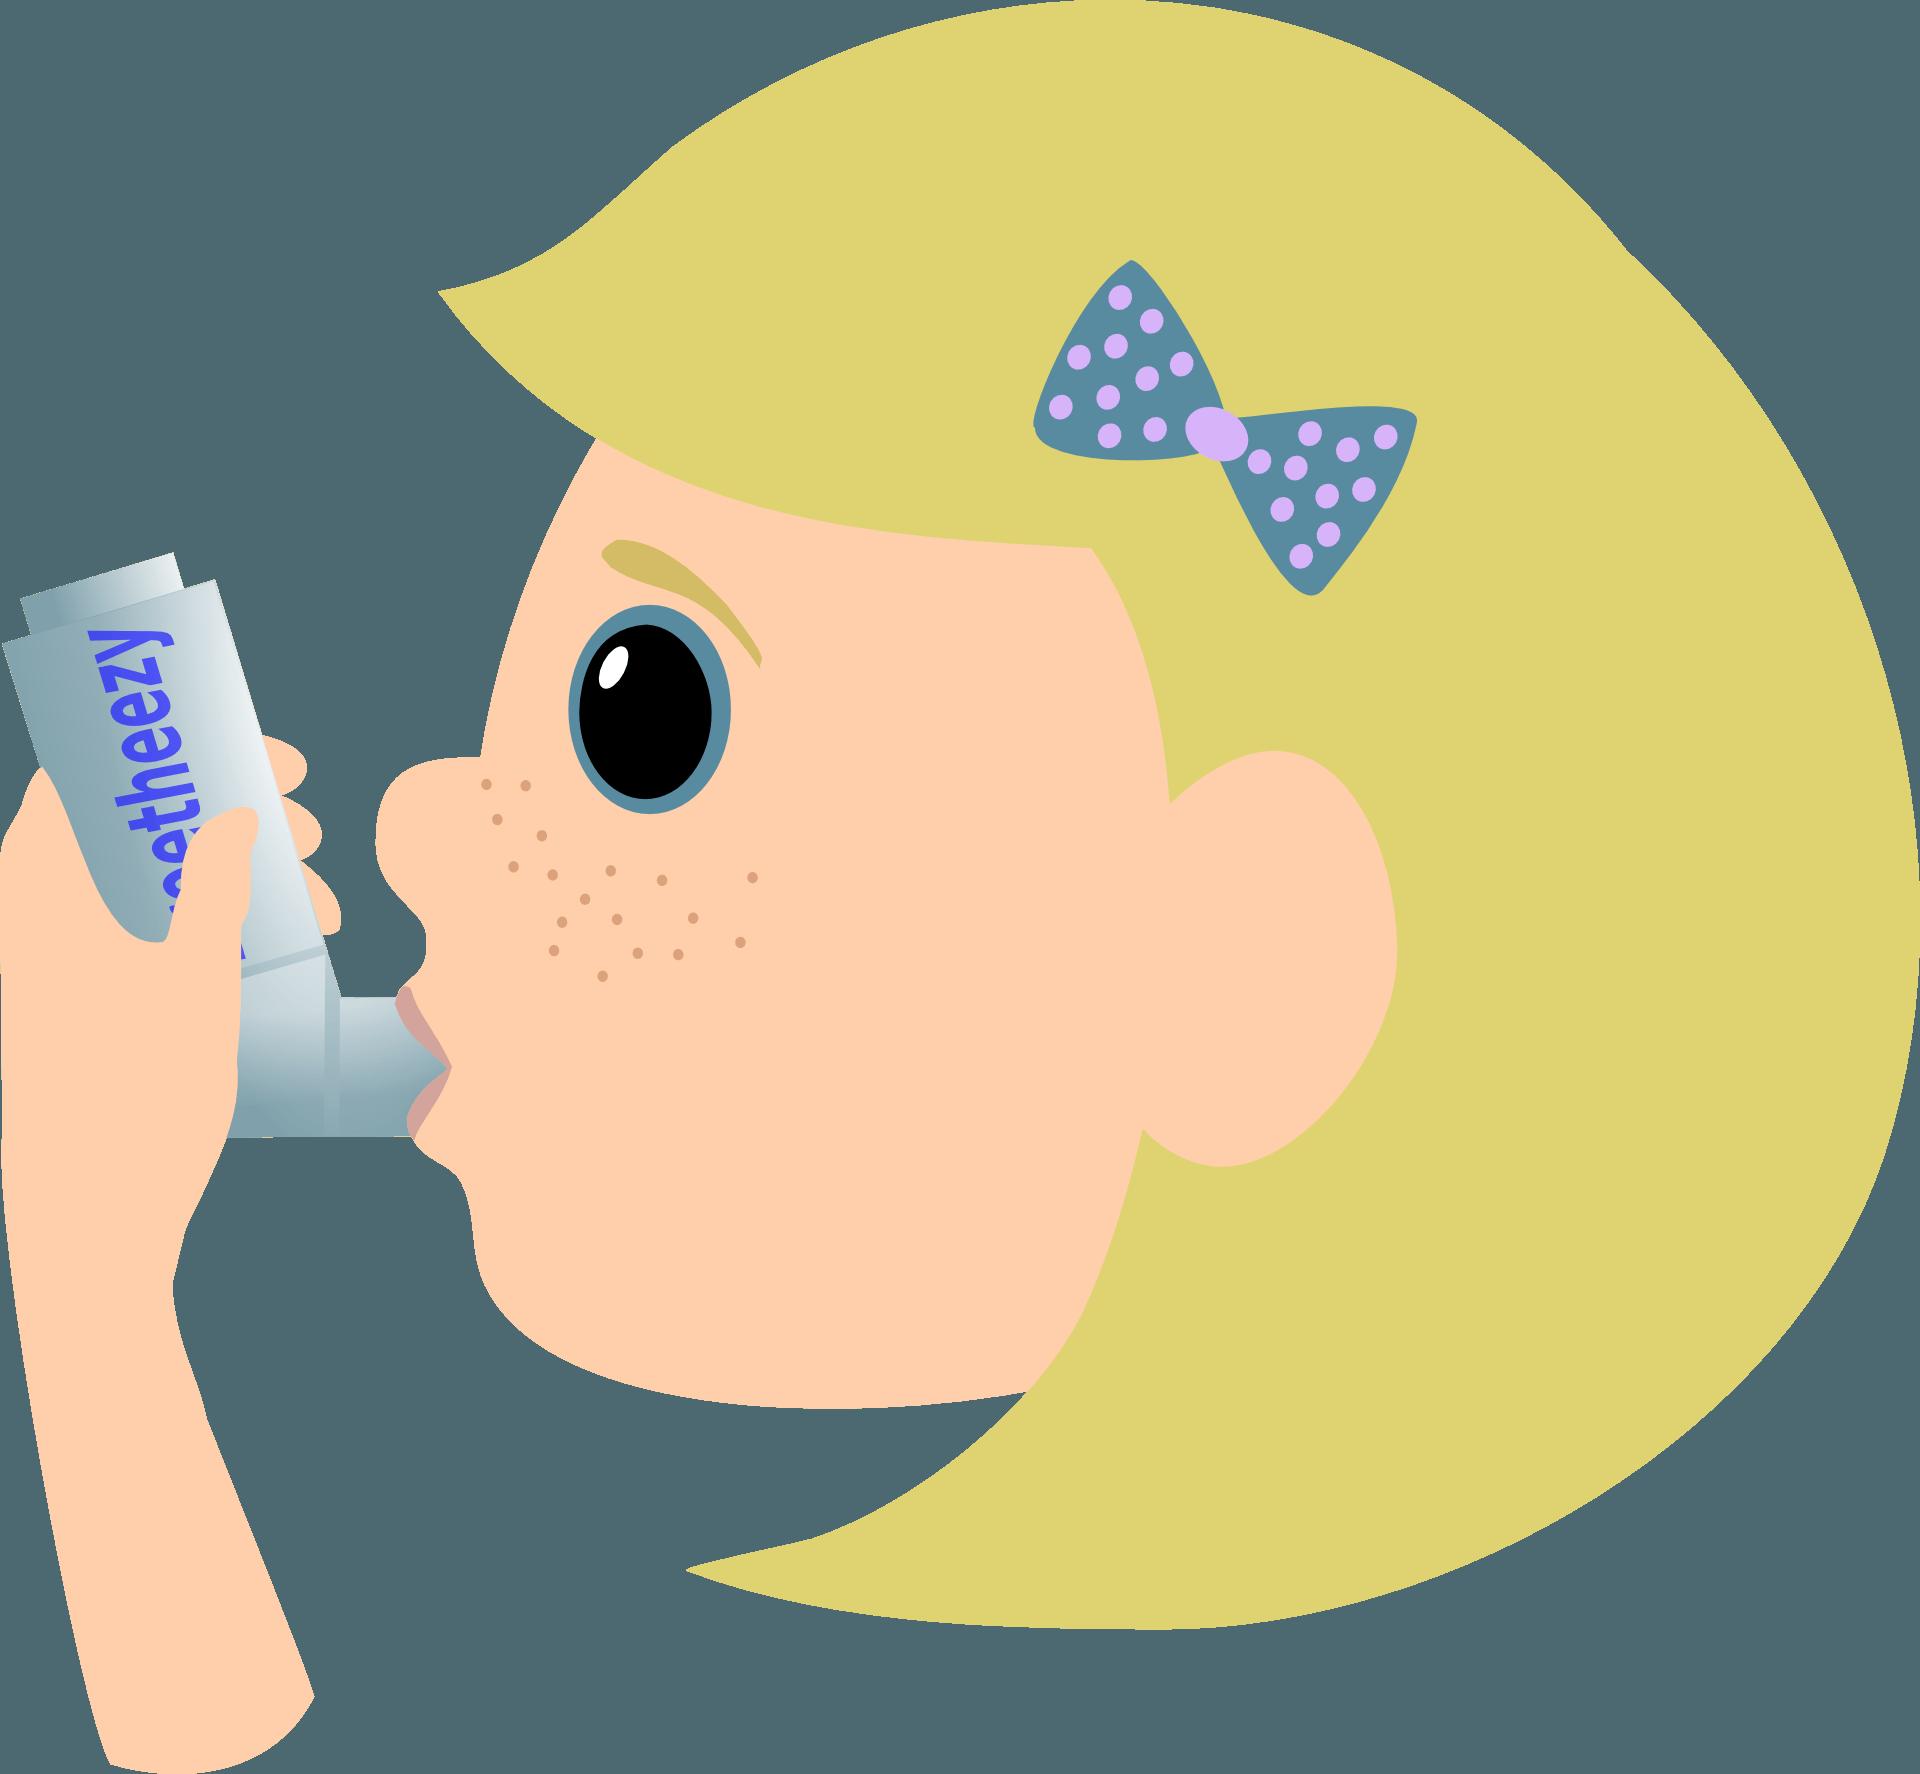 Flu clipart phlegm. Asthma steroid inhalers you